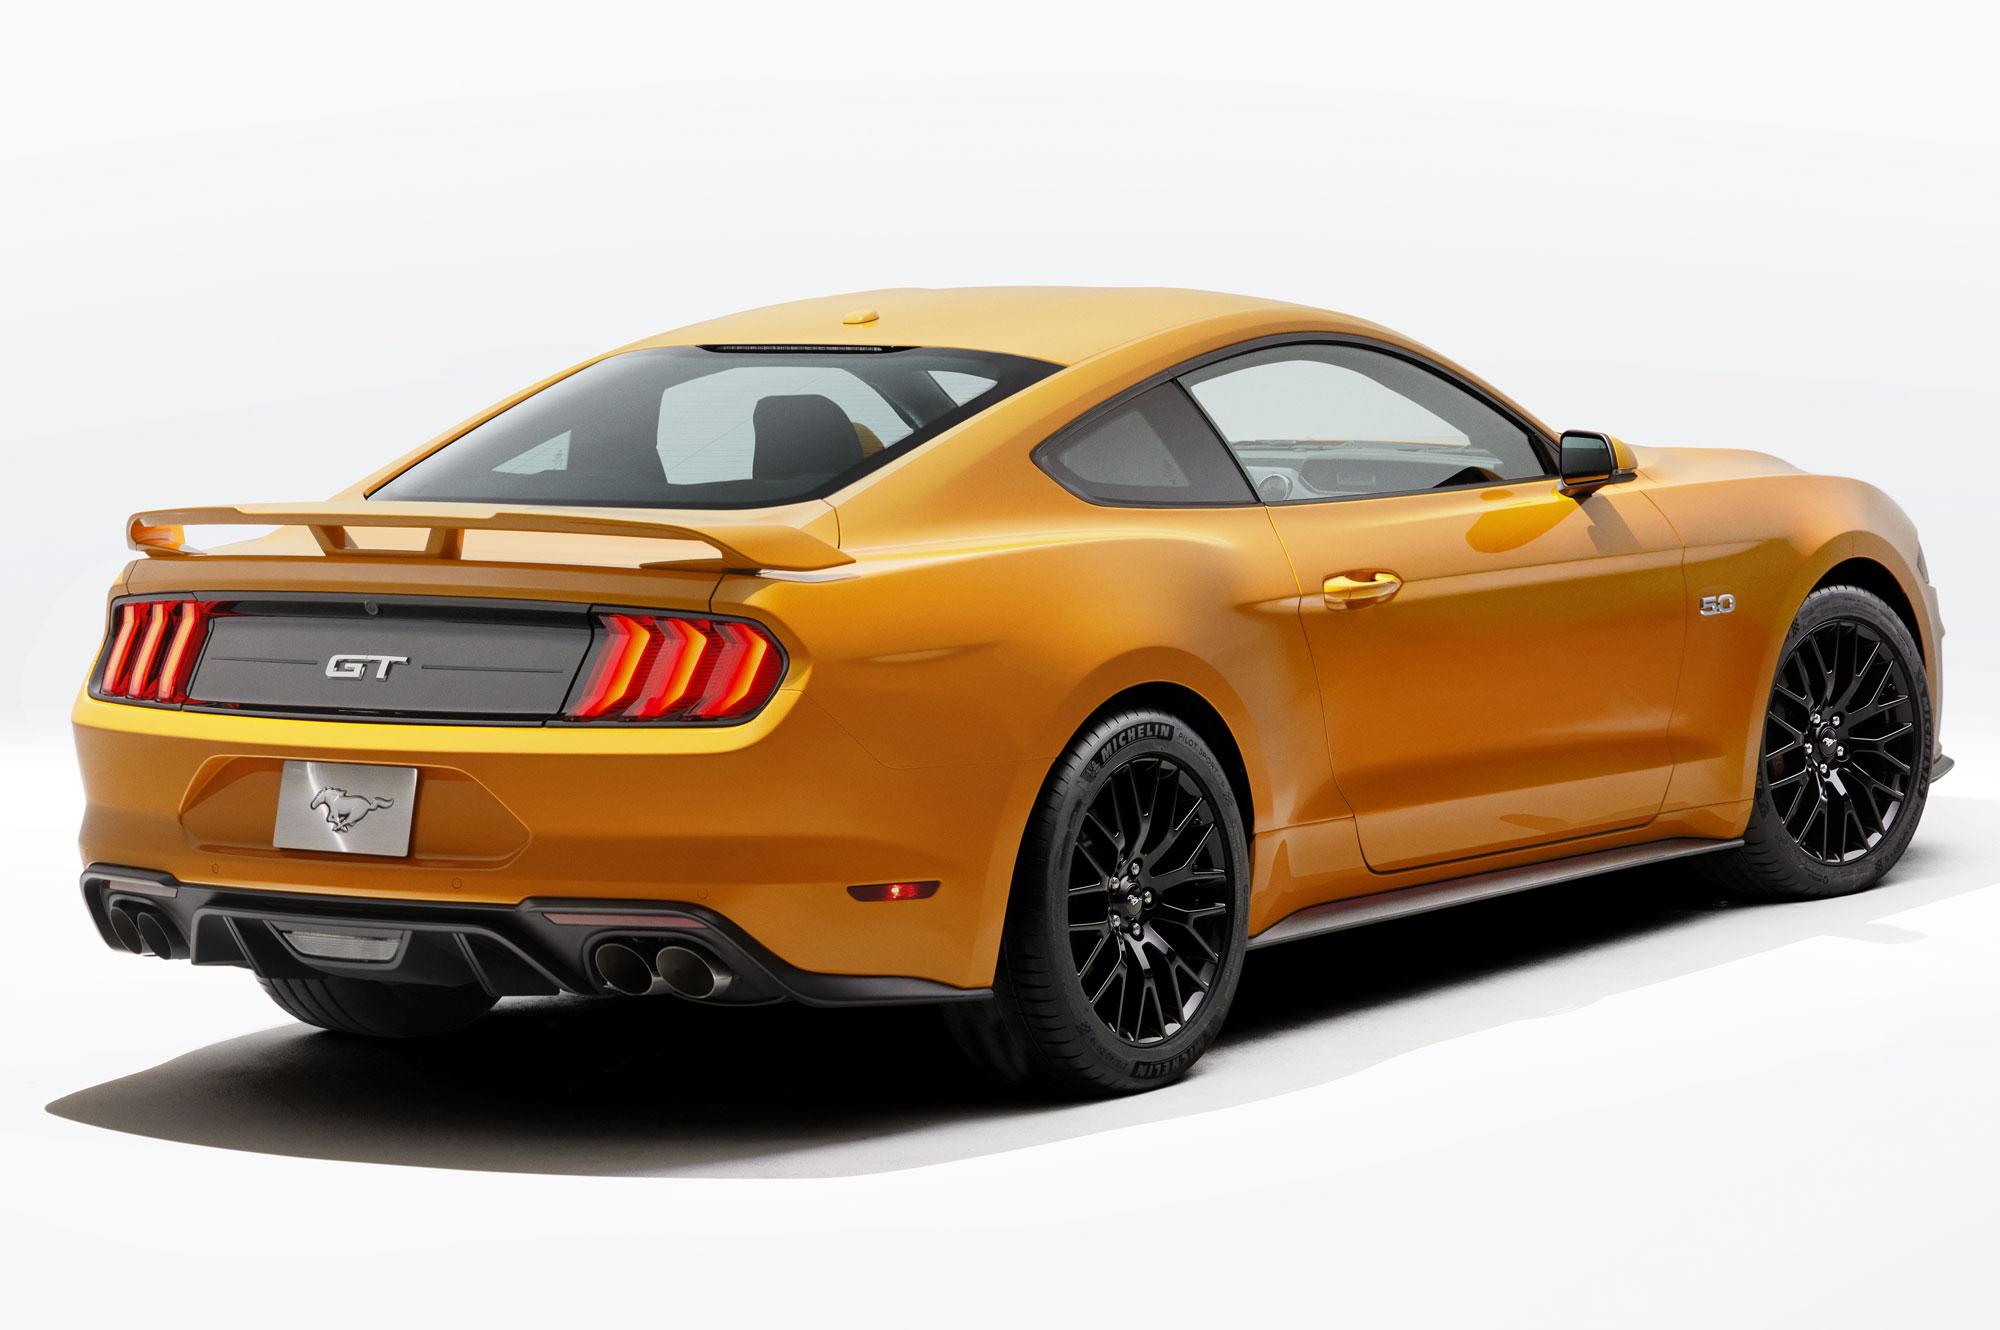 Megújult a Ford Mustang  a2c1a13a5d